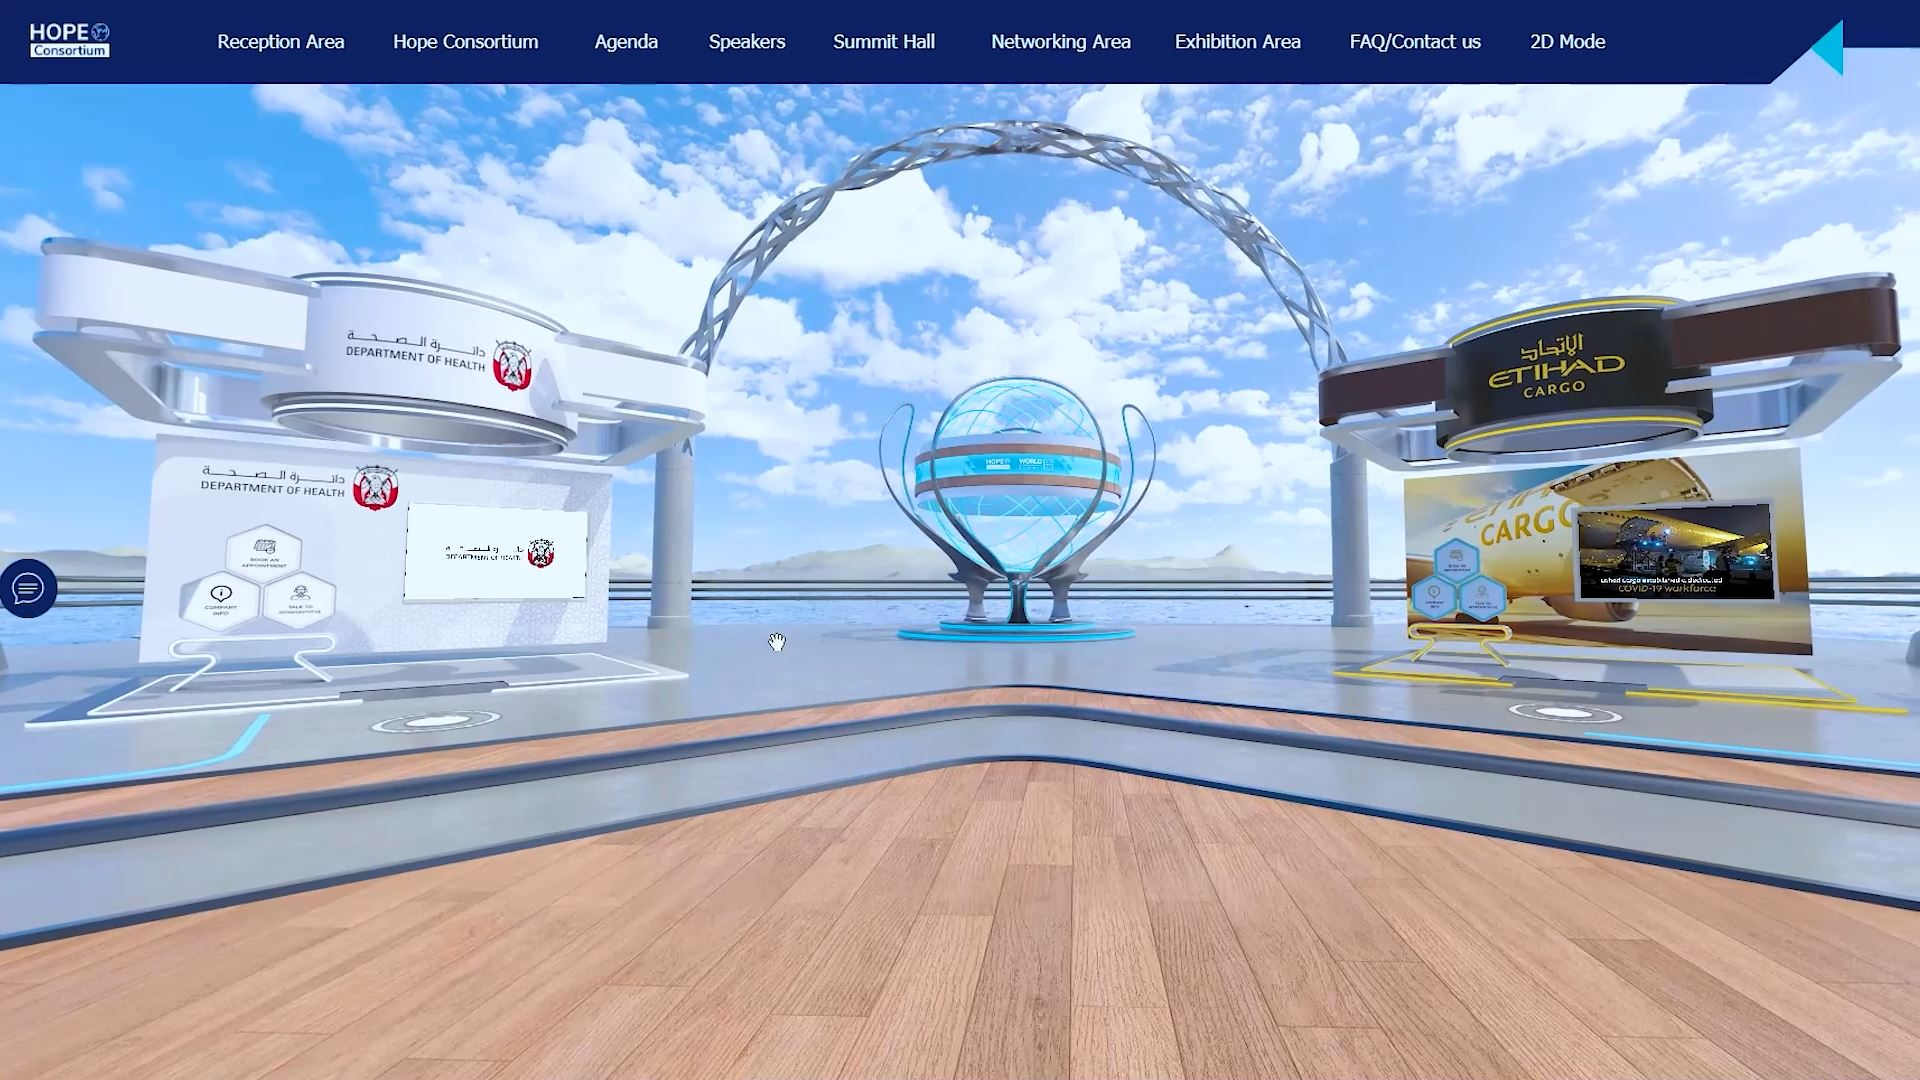 hope consortium world immunization and logistics summit virtual exhibition area